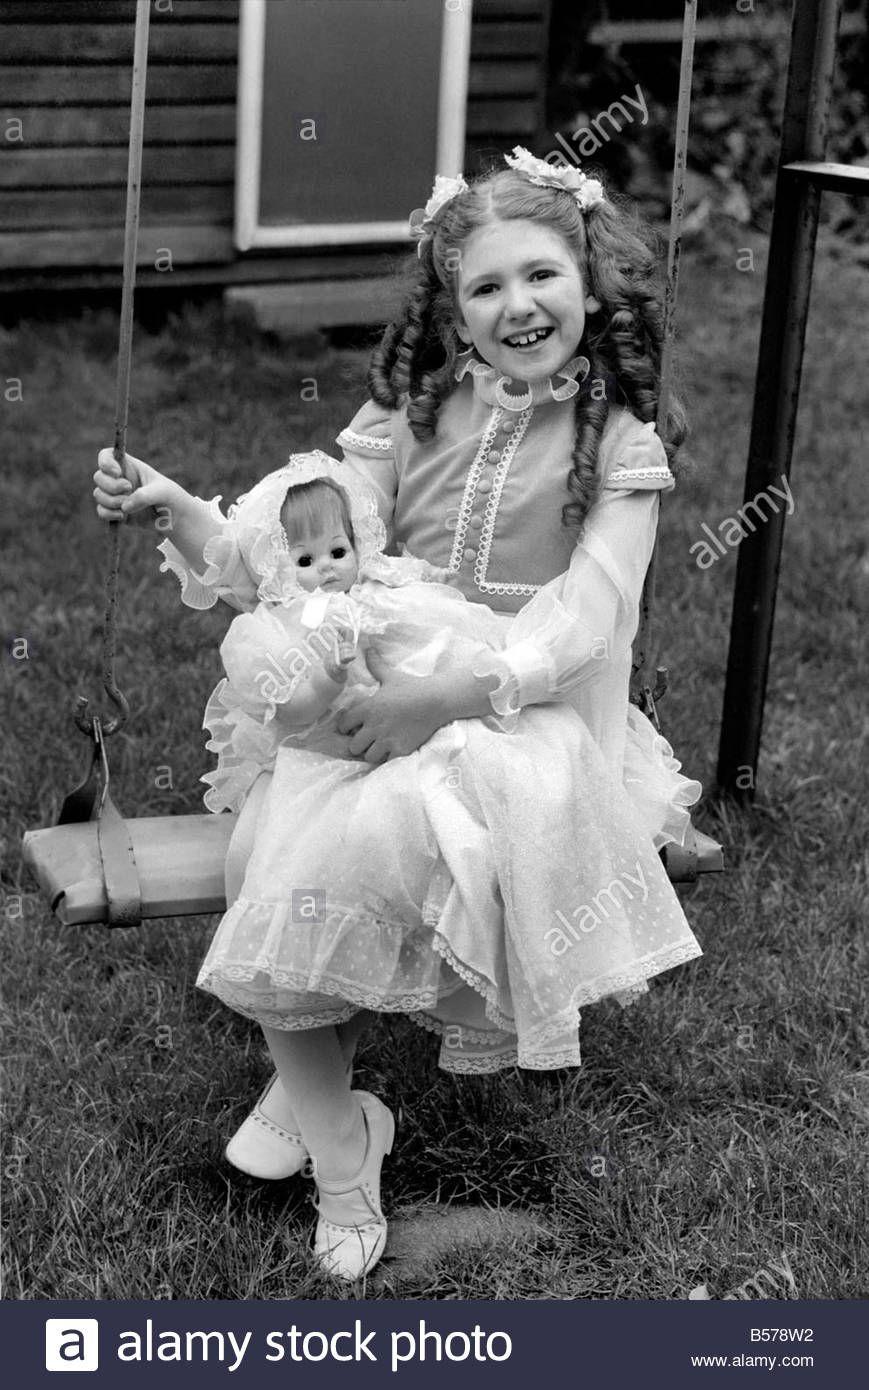 Bonnie Langford (born 1964) Bonnie Langford (born 1964) new foto